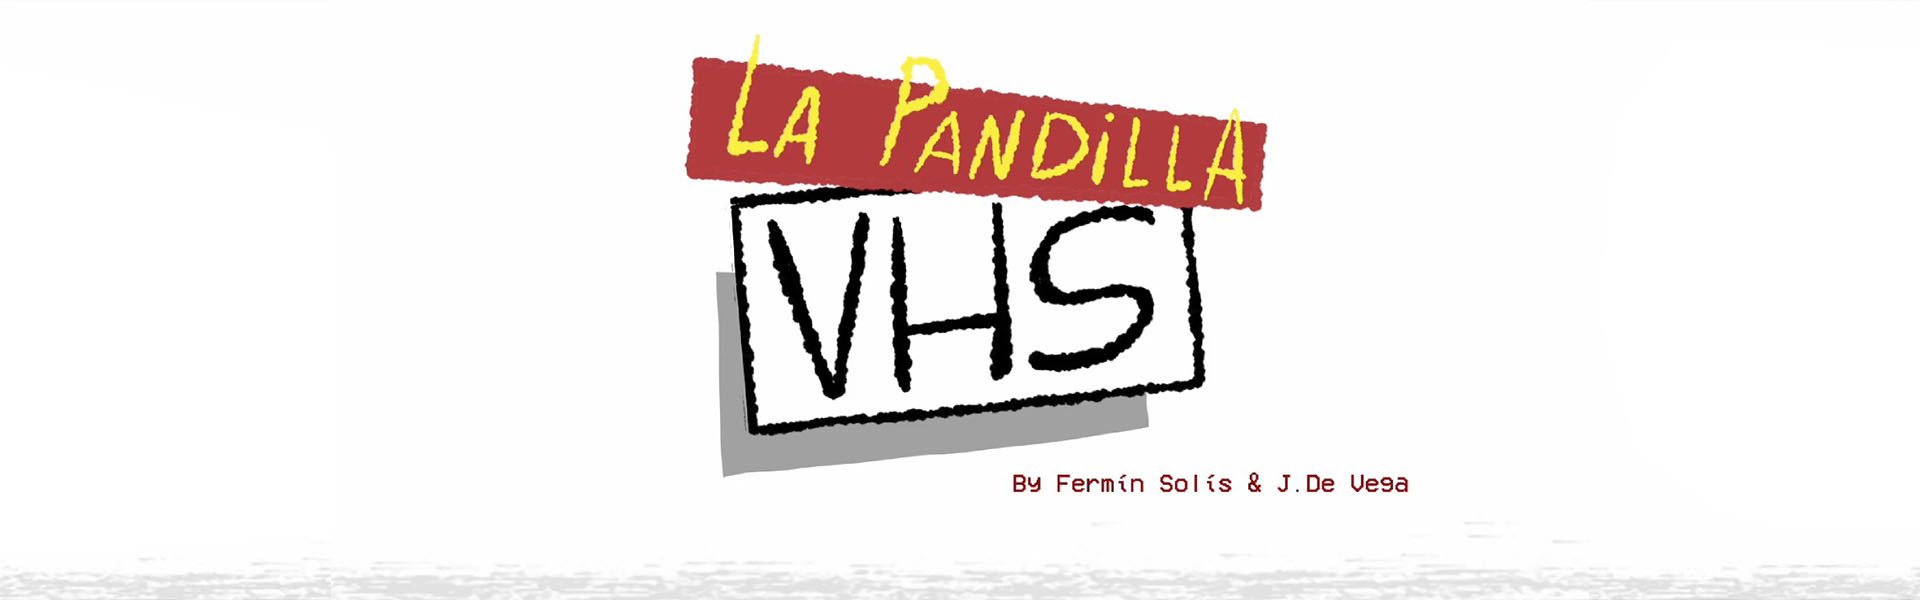 LA PANDILLA V.H.S.